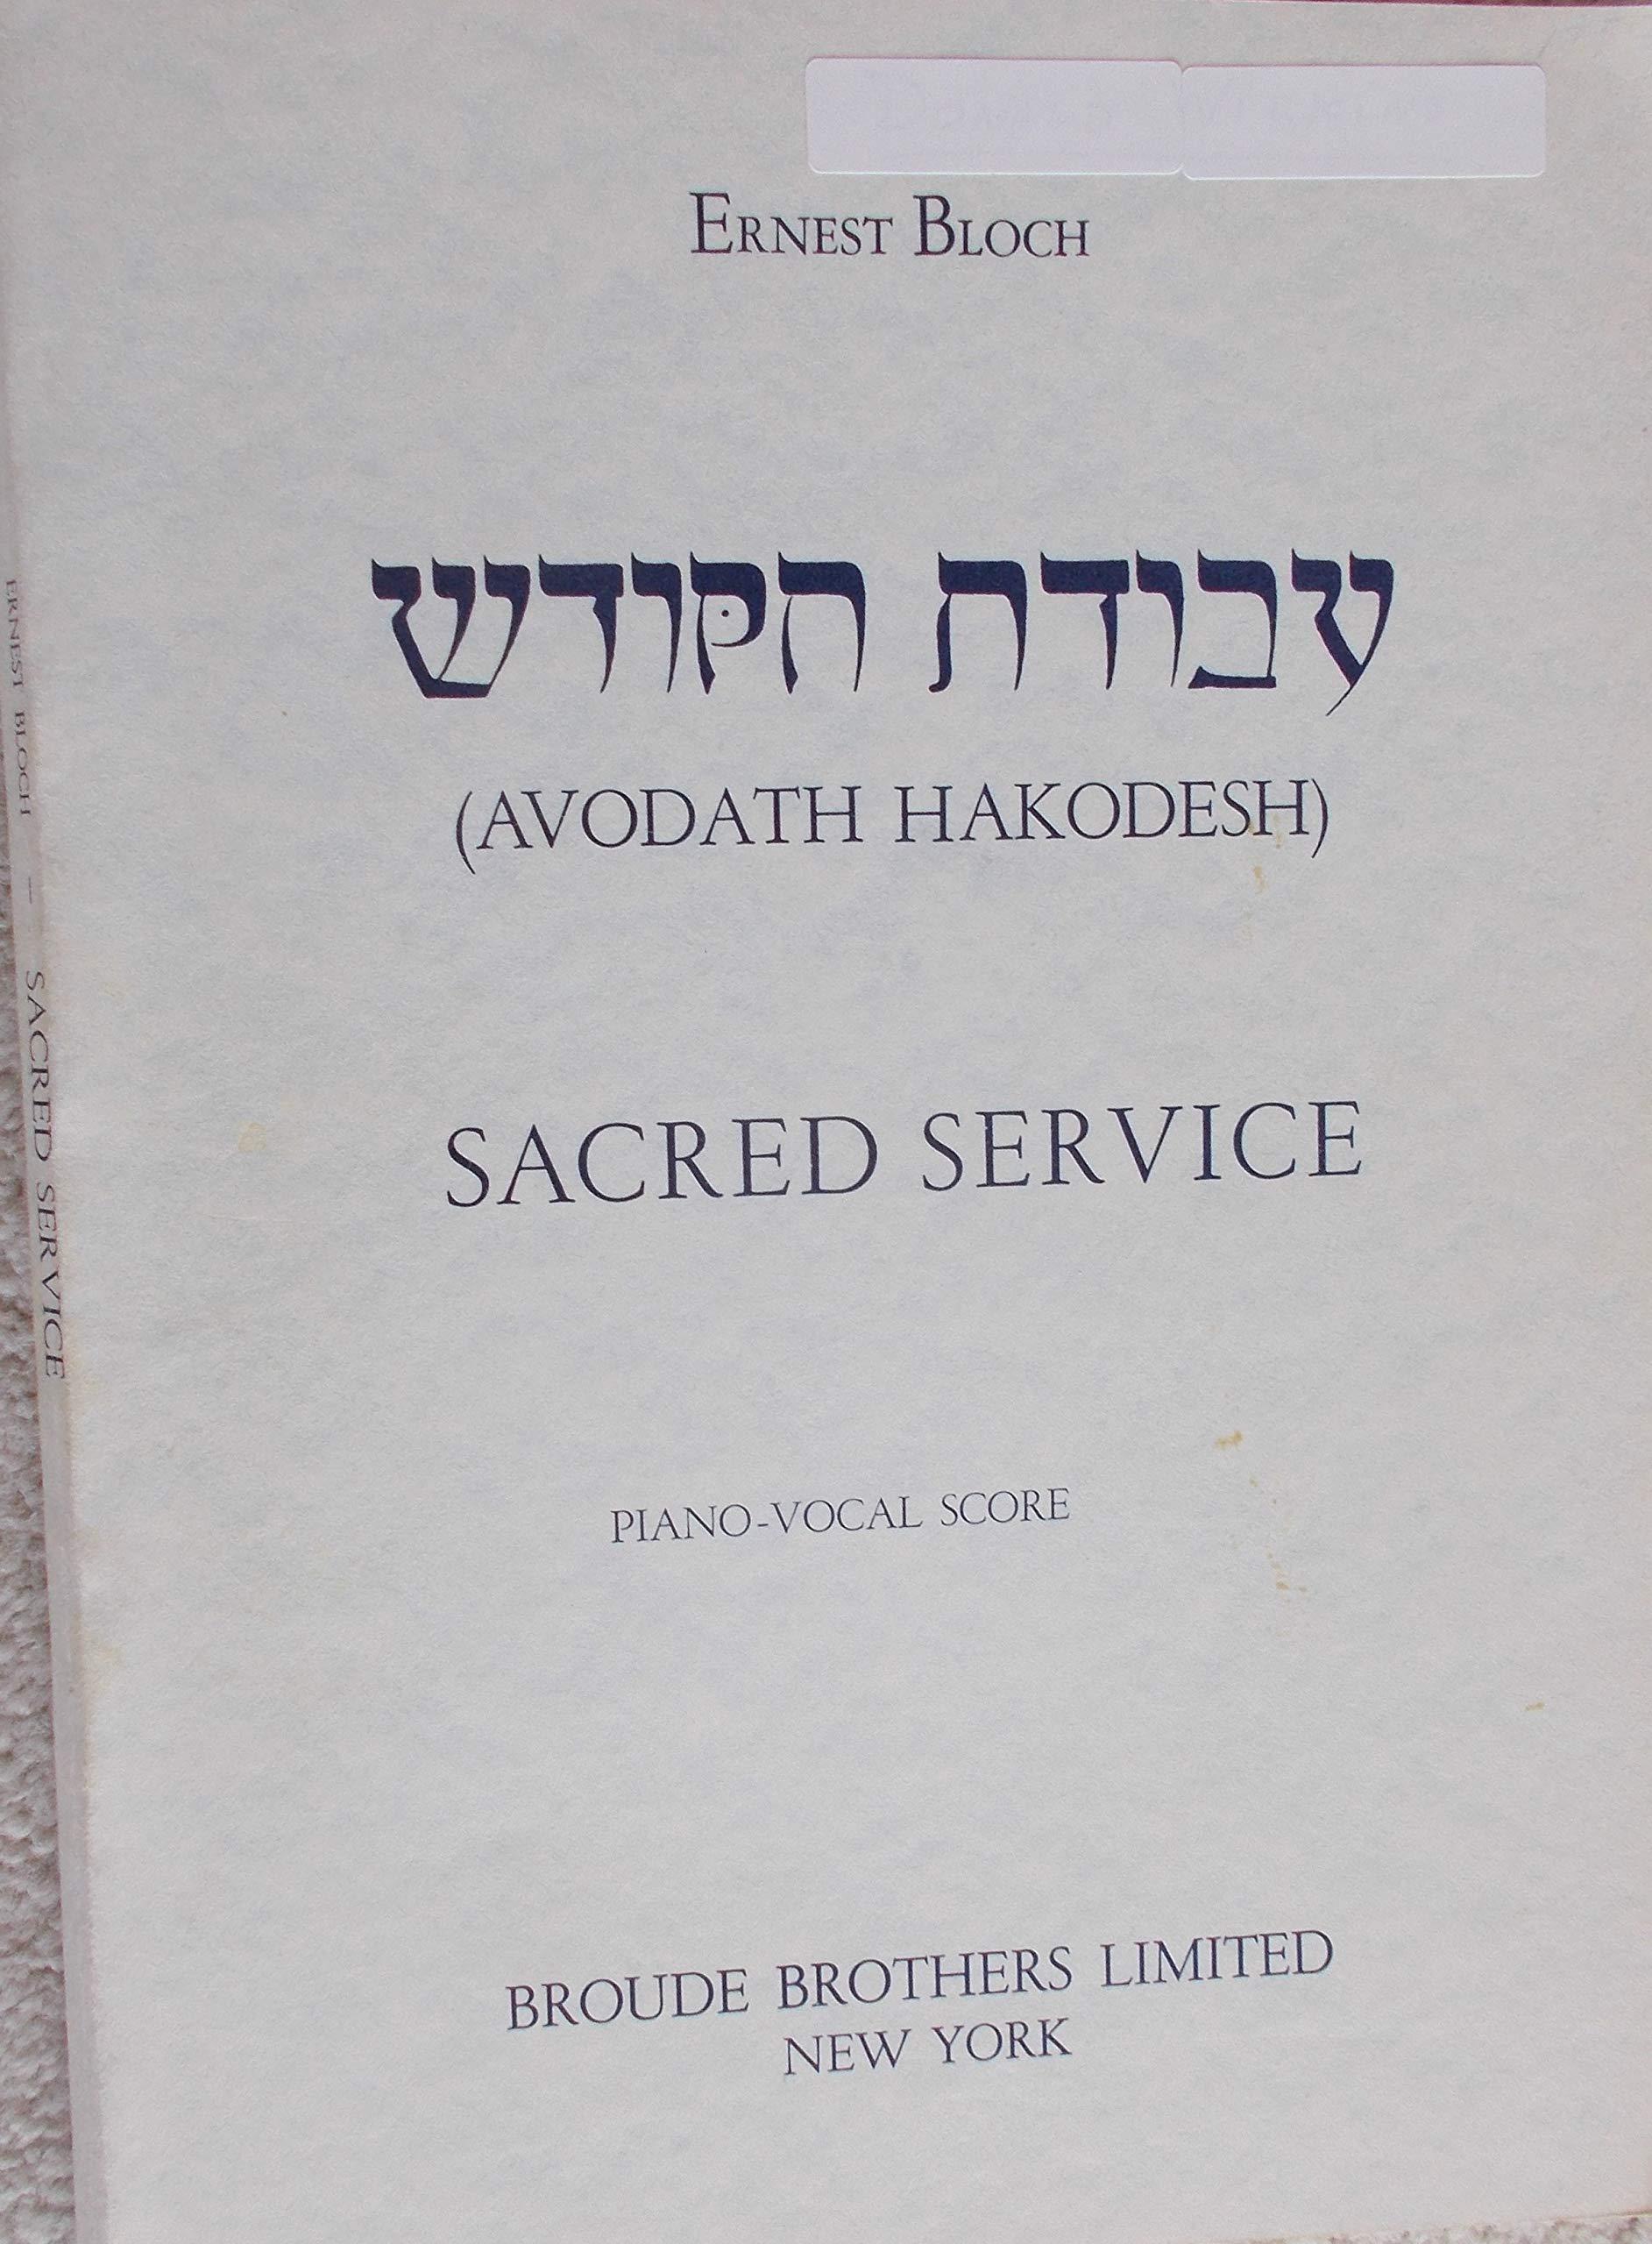 Sacred Service (Avodath Hakodesh). Piano Vocal Score SATB: Ernest Bloch, David Stevens: Amazon.com: Books